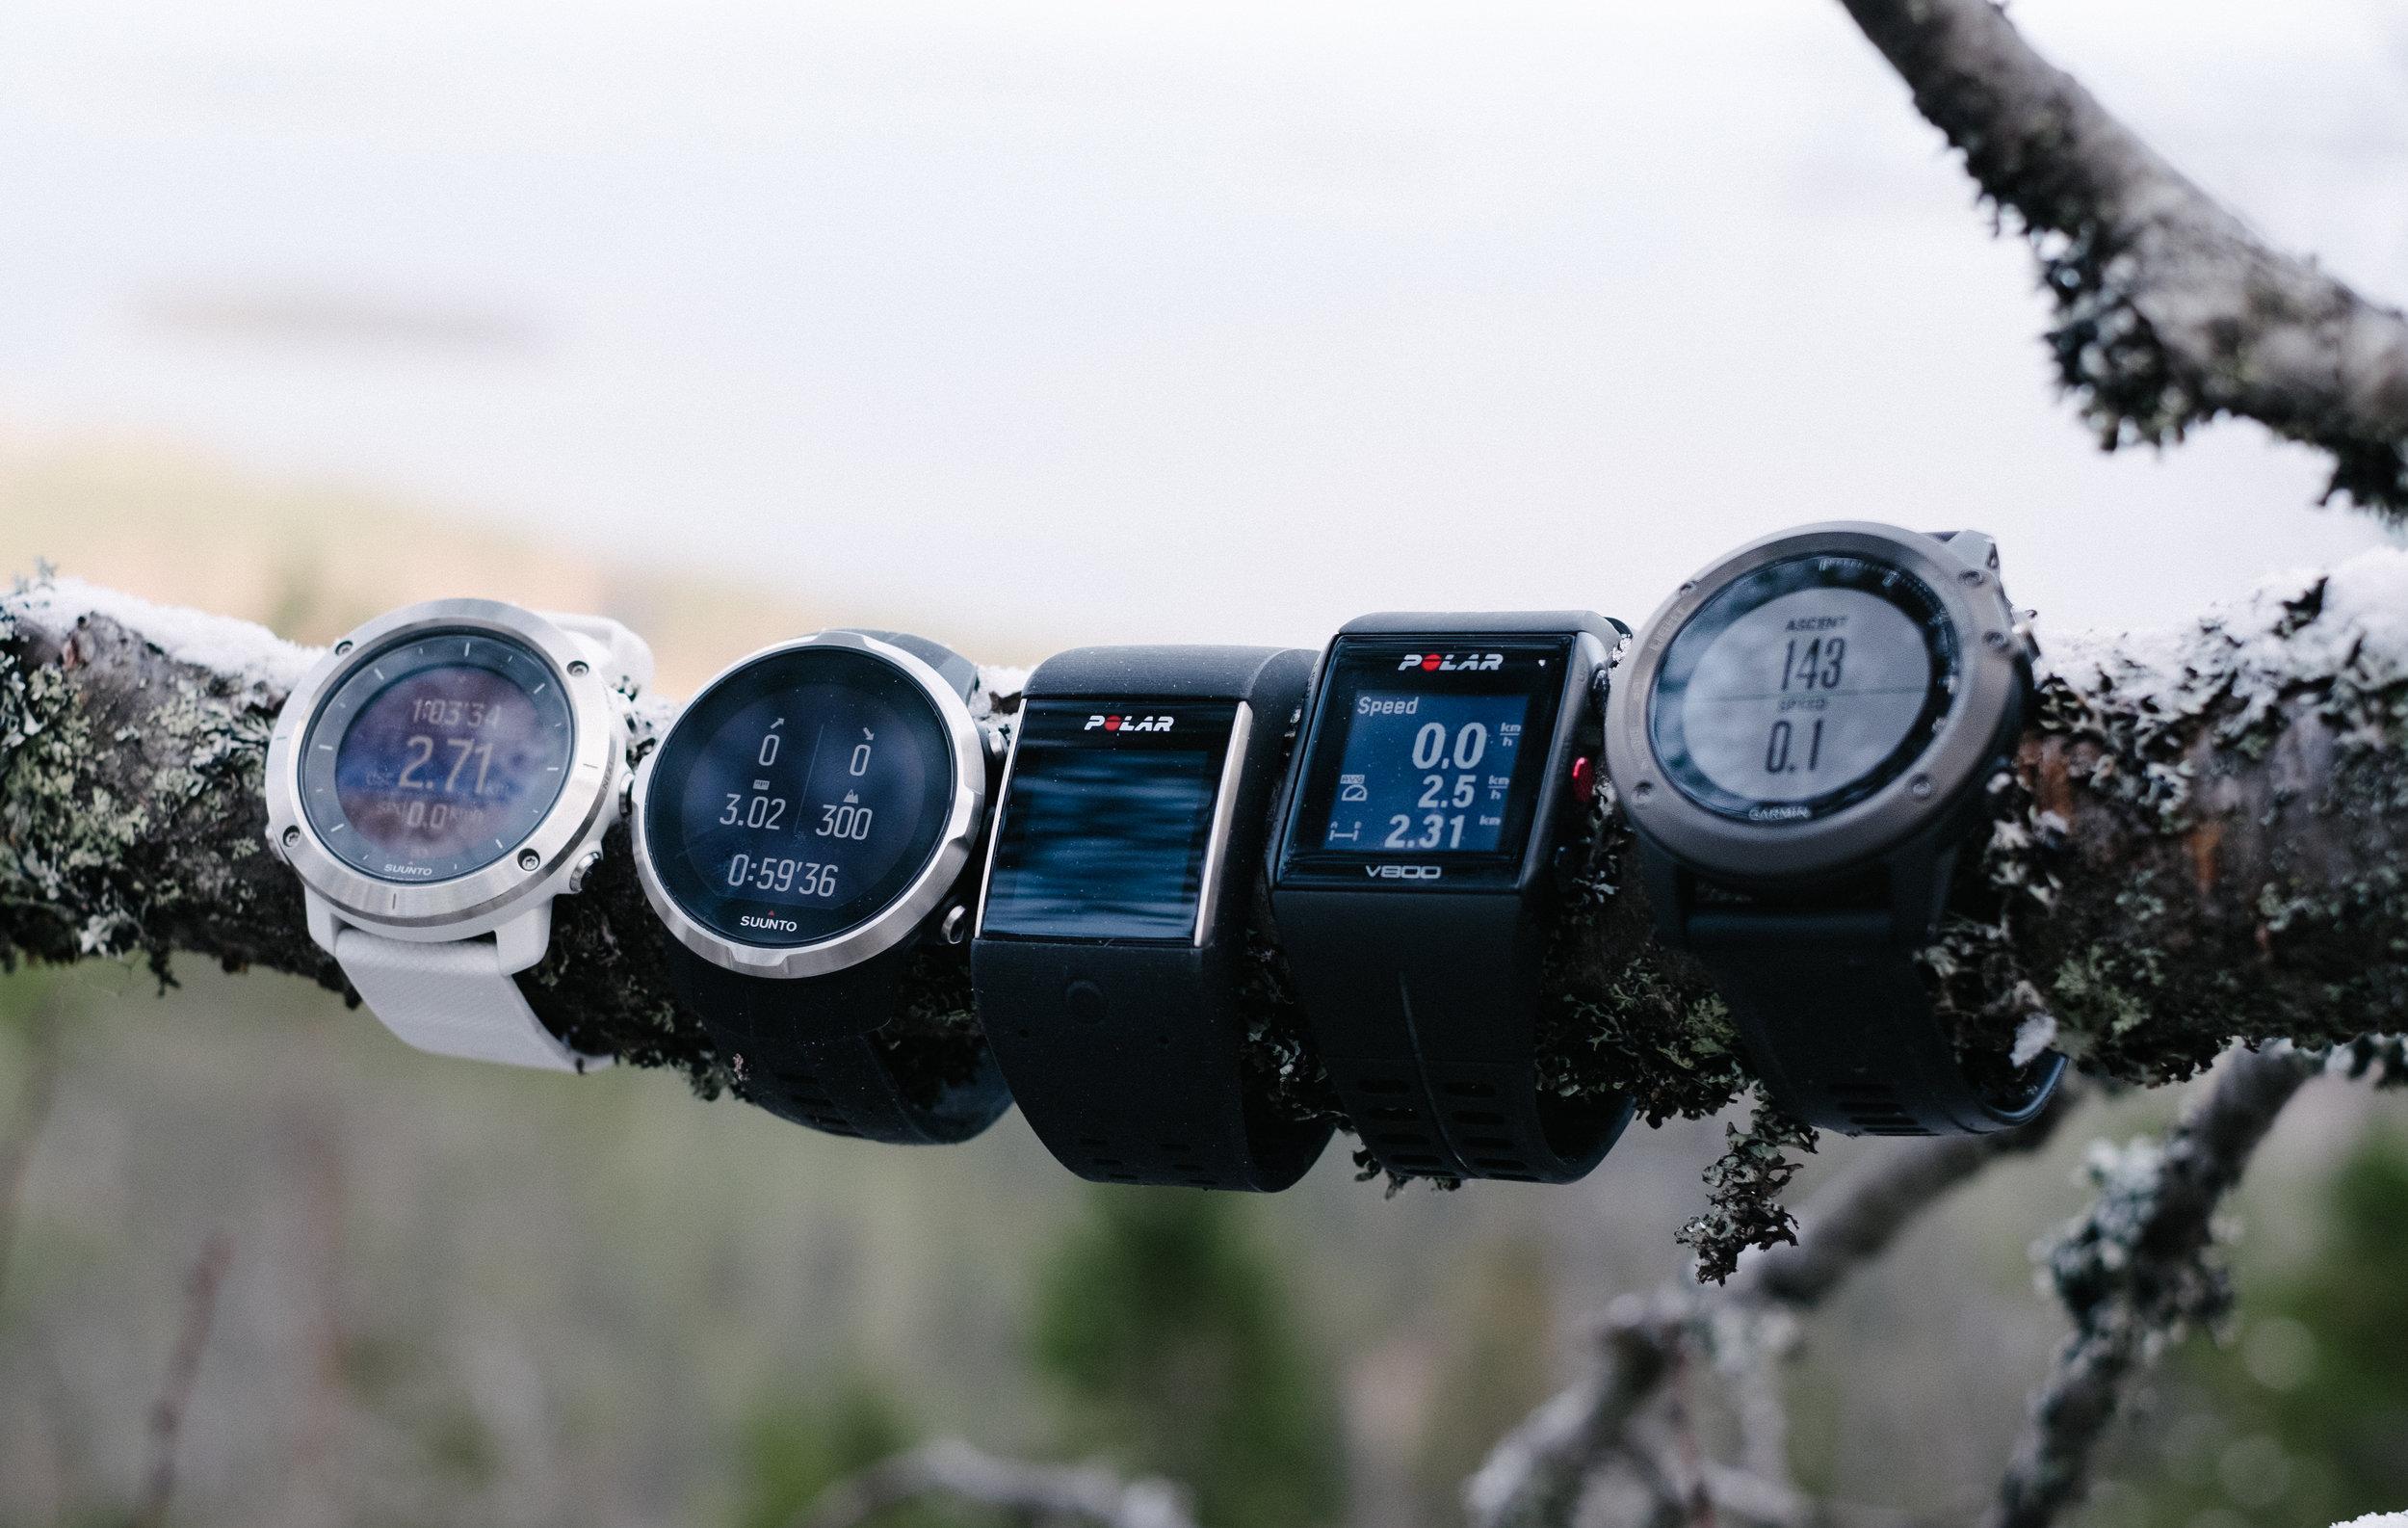 From the left: Suunto Traverse, Suunto Spartan Sport, Polar M600, Polar V800, Garmin Fenix 3 HR